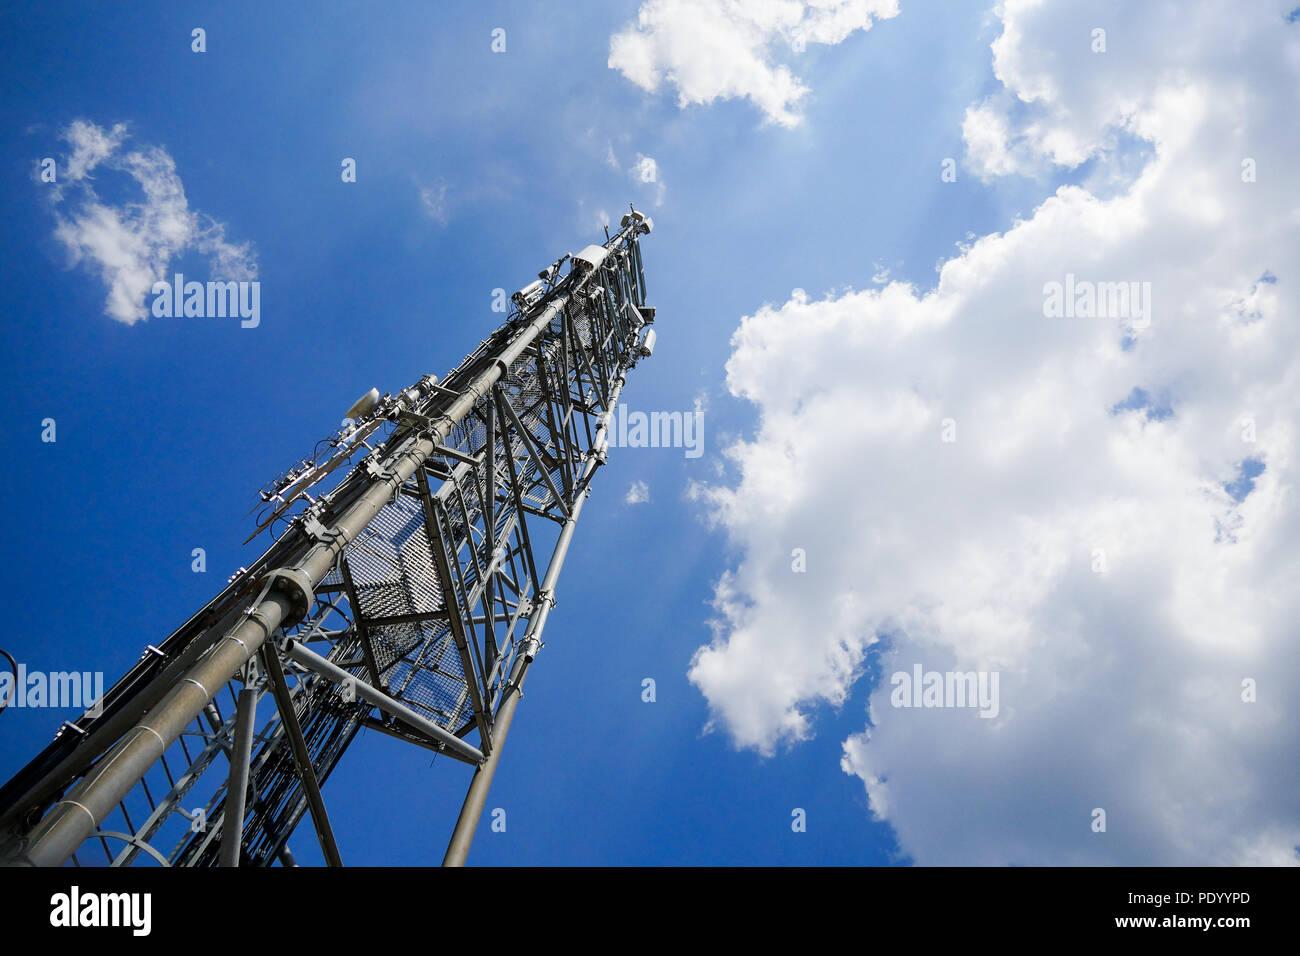 Relay antenna, Barjols, Var, France - Stock Image